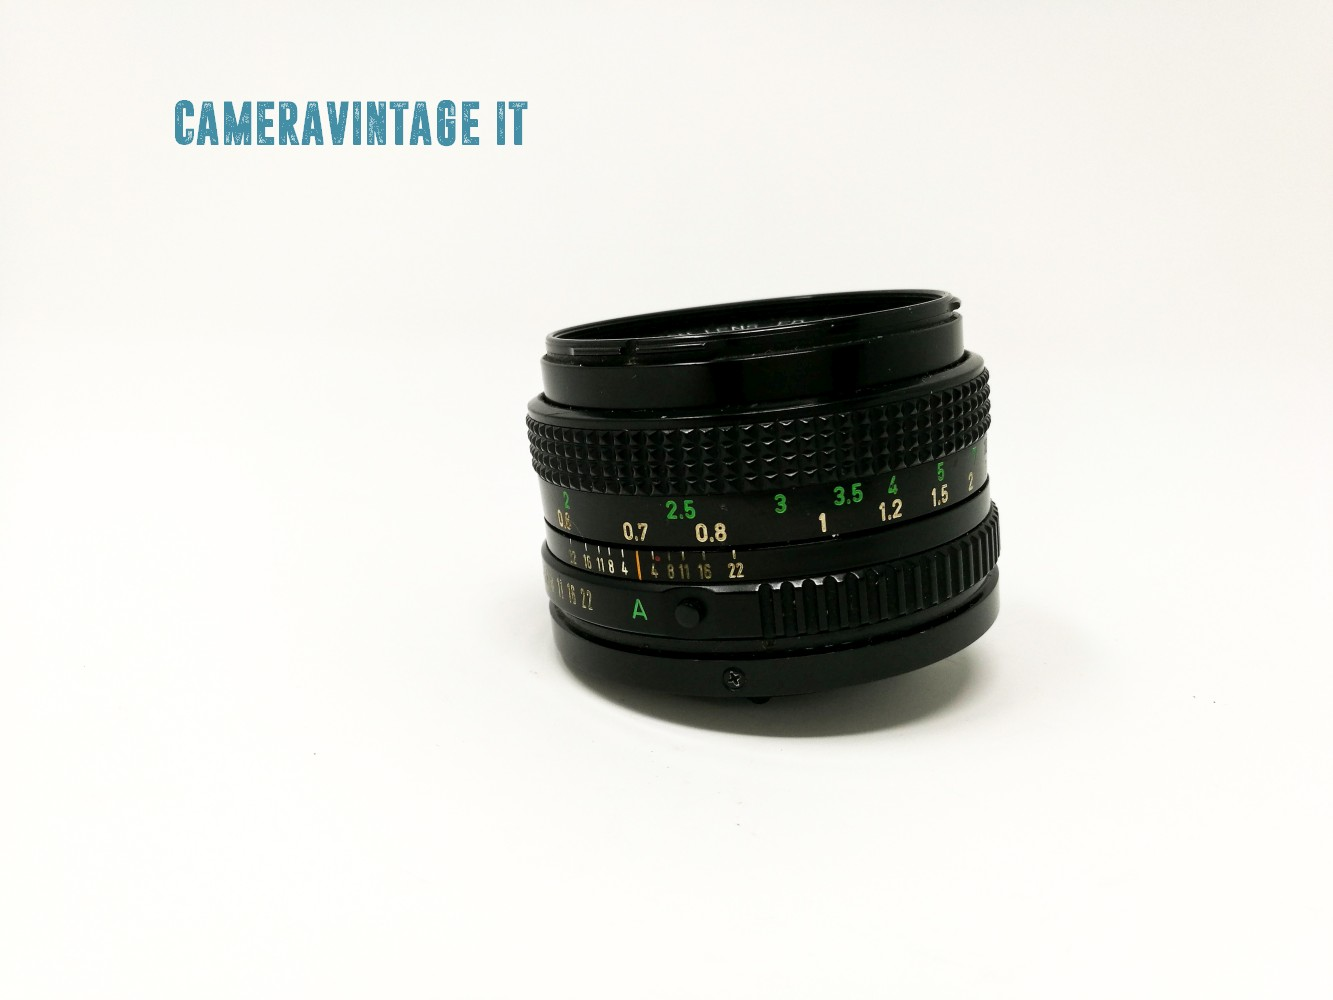 CANONFD 50mm f/1.8